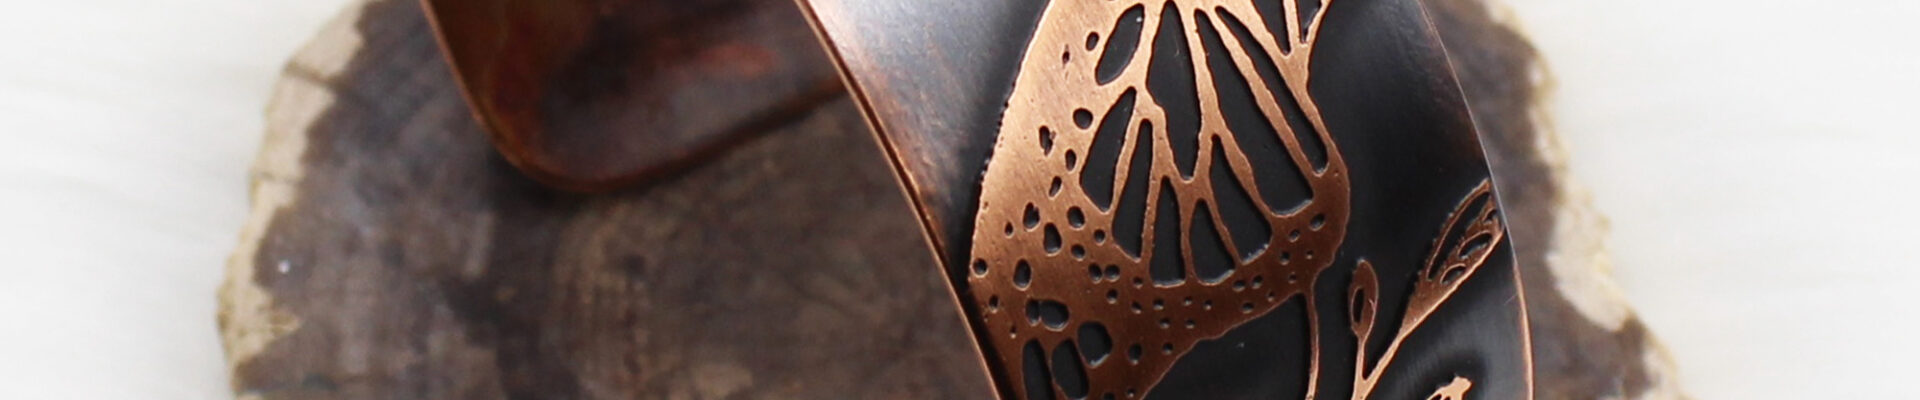 Butterfly Floral, Copper Cuff, Handmade Bracelet